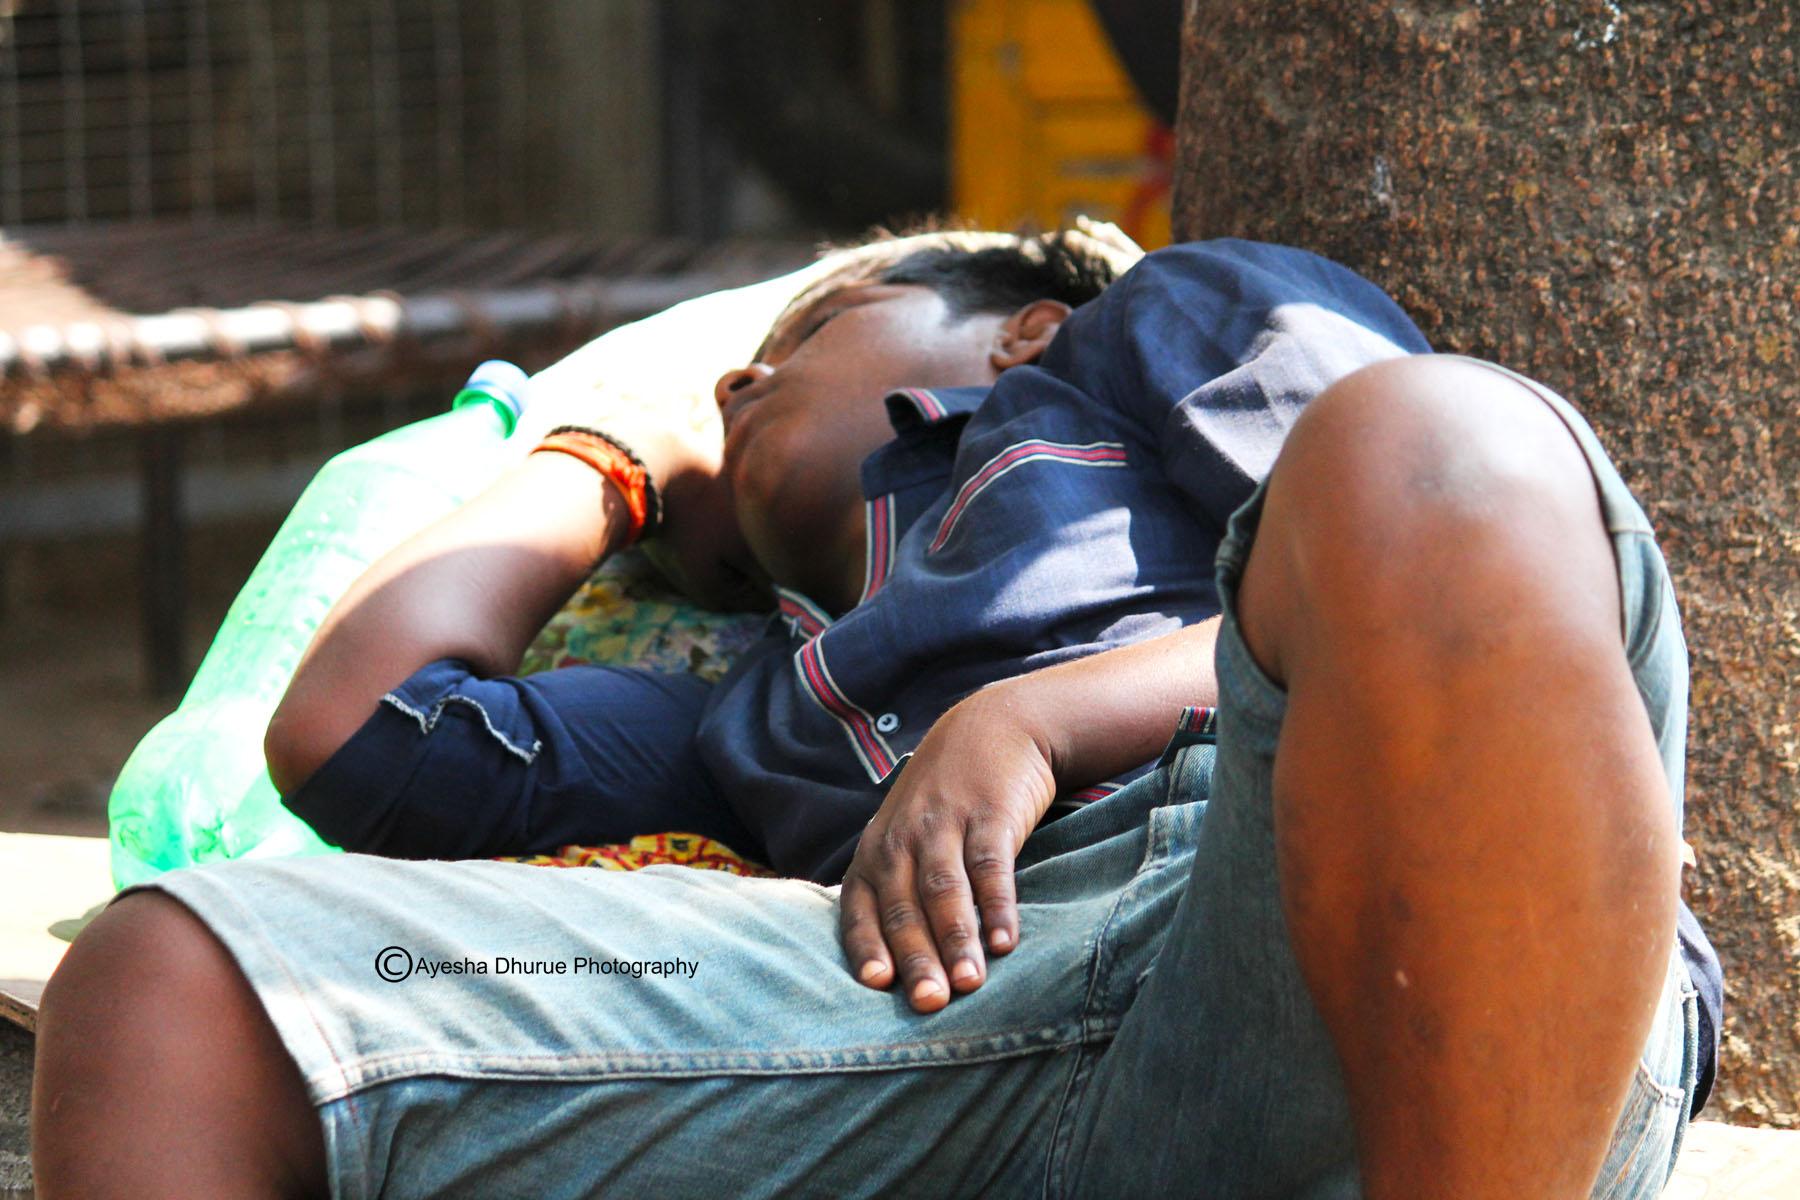 mumbai people photography children labor work street ayesha dhurue photography image gallery  (2)